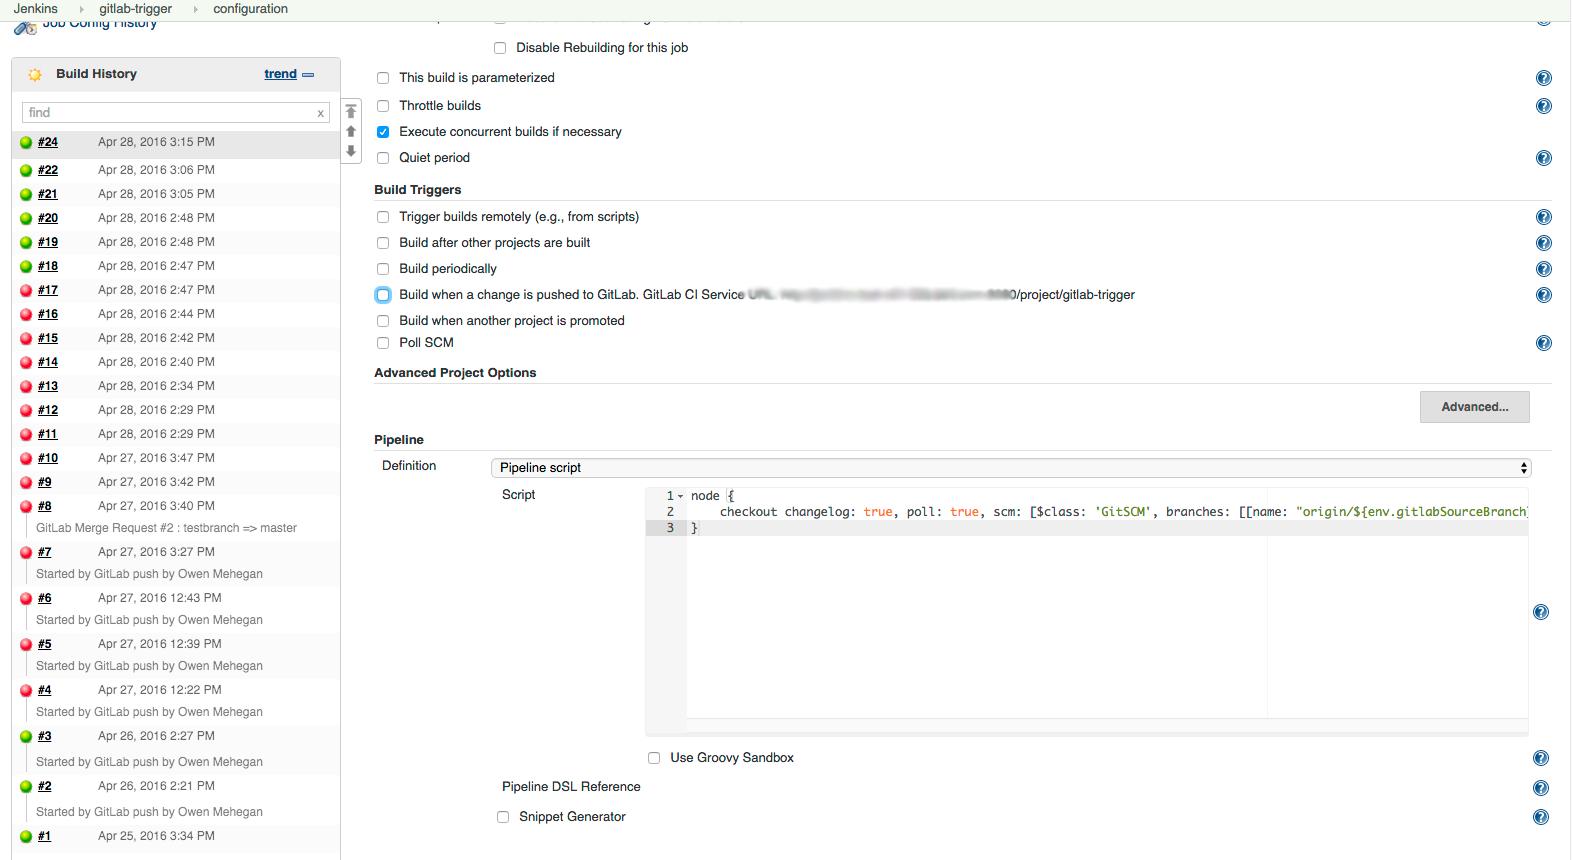 JENKINS-34549] Pipeline script editor is squashed when gitlab plugin